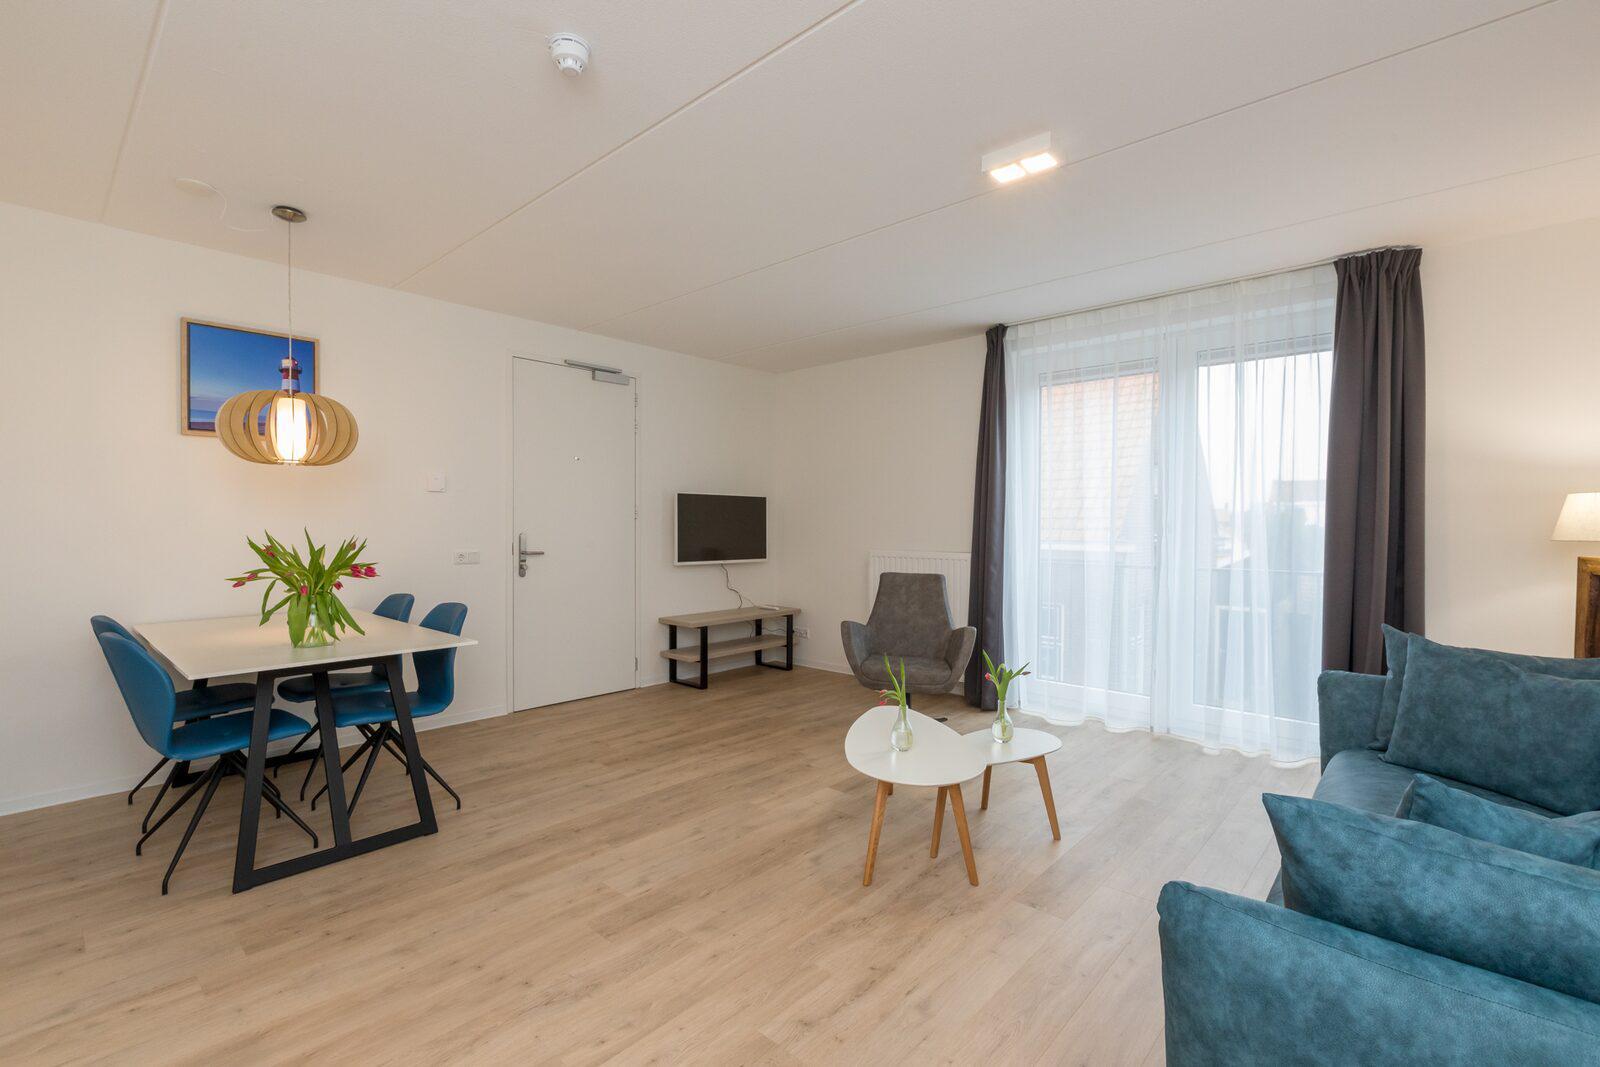 Aparthotel Zoutelande Luxe appartement 3 personen